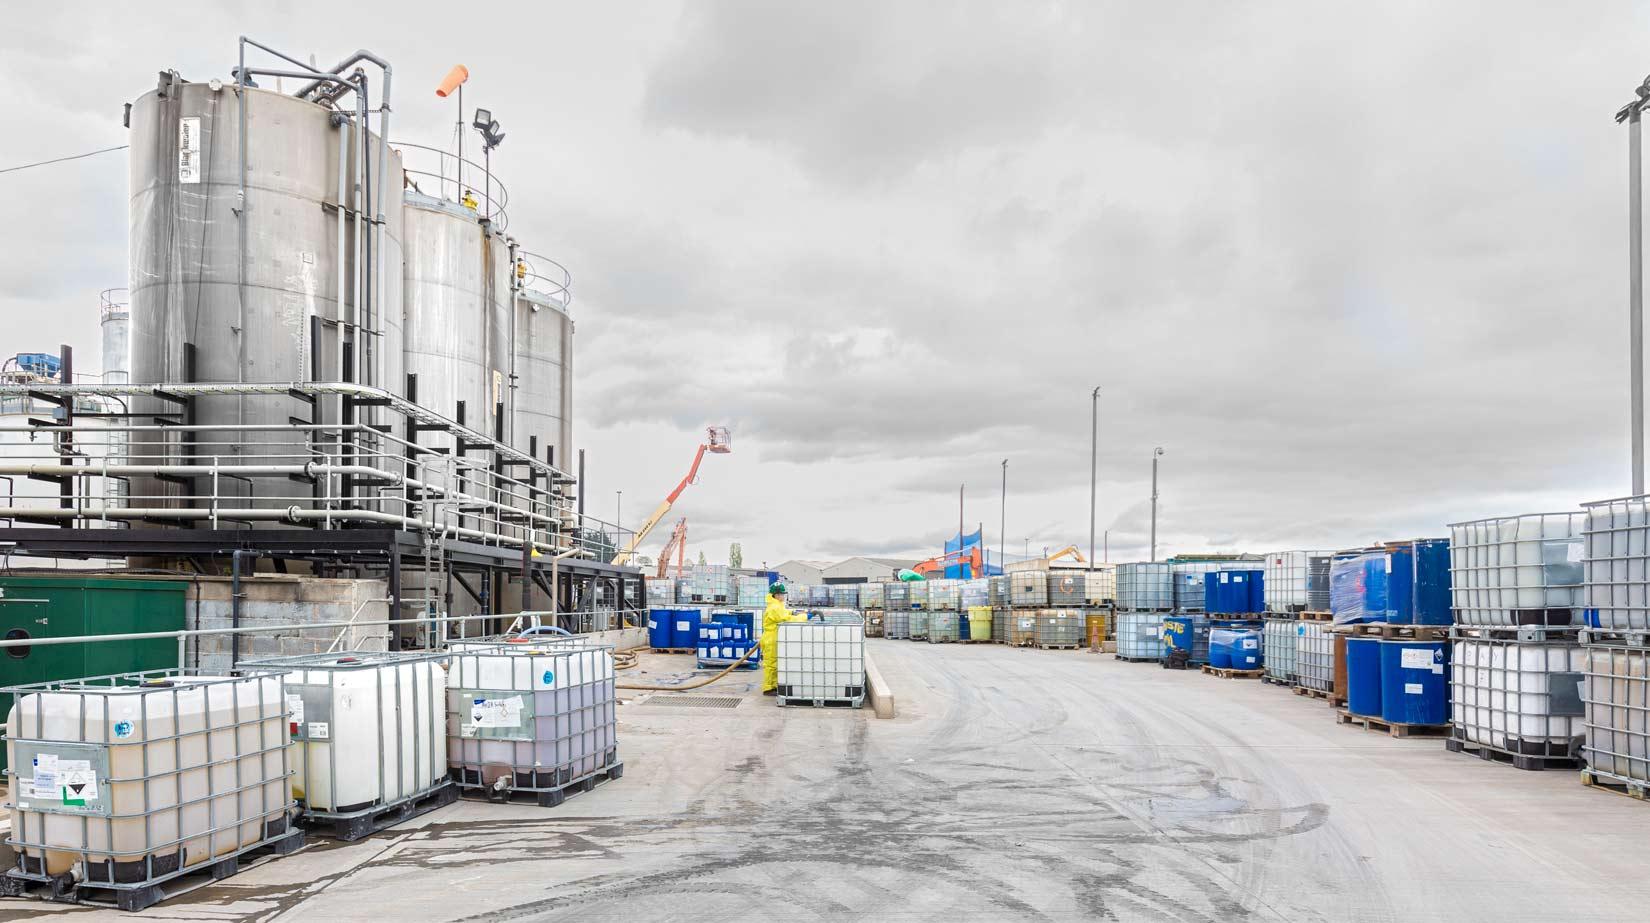 Instrail yard almost monochrome by Industrial Photographer Matthew Jones